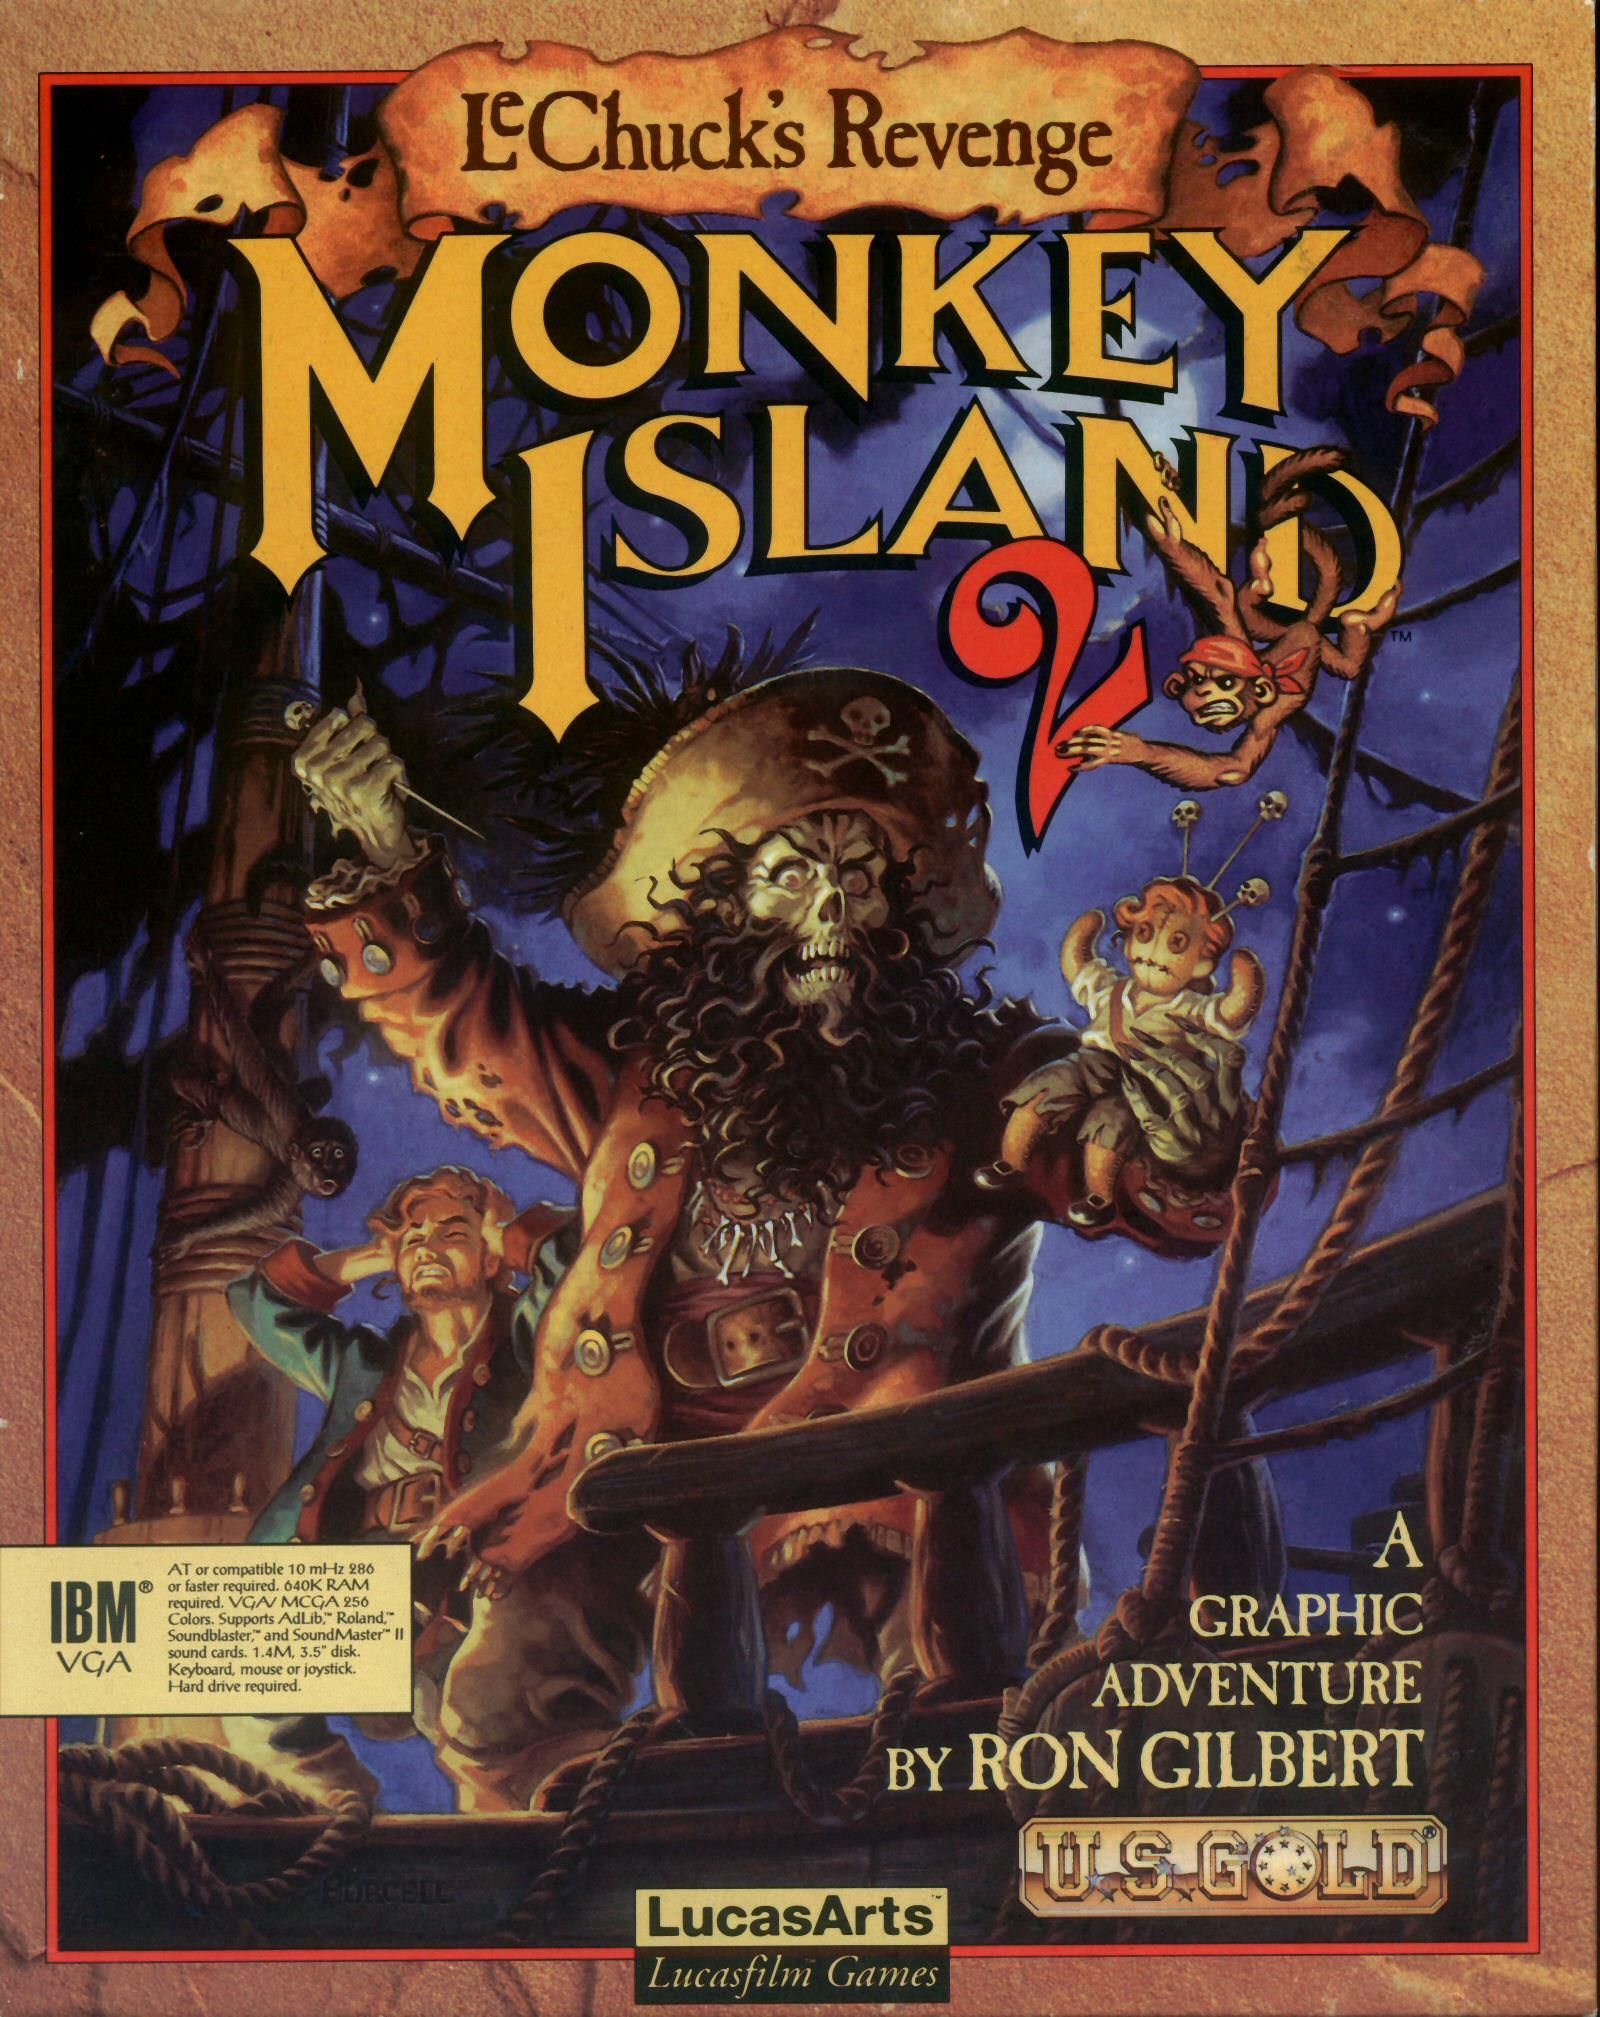 Monkey island 2 lechuck s revenge concept art the international - Monkey Island 2 Lechuck S Revenge